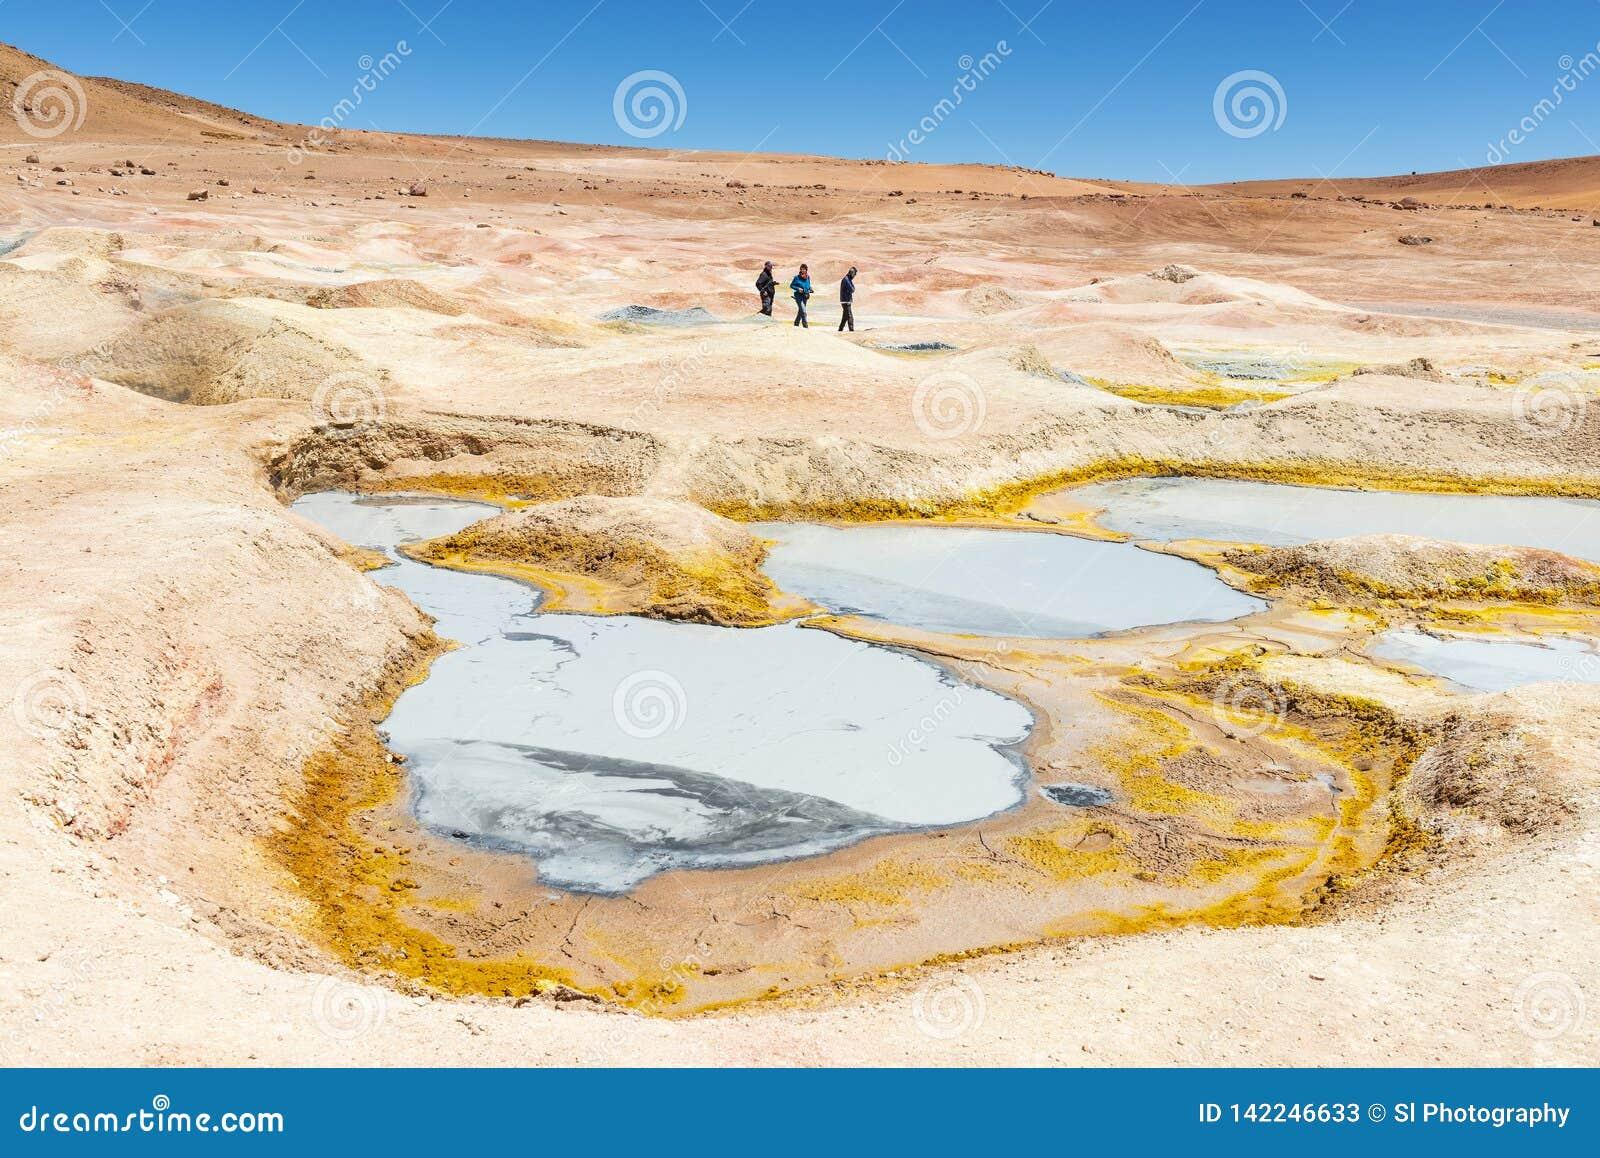 Sol de Manana volcano activity, Bolivia